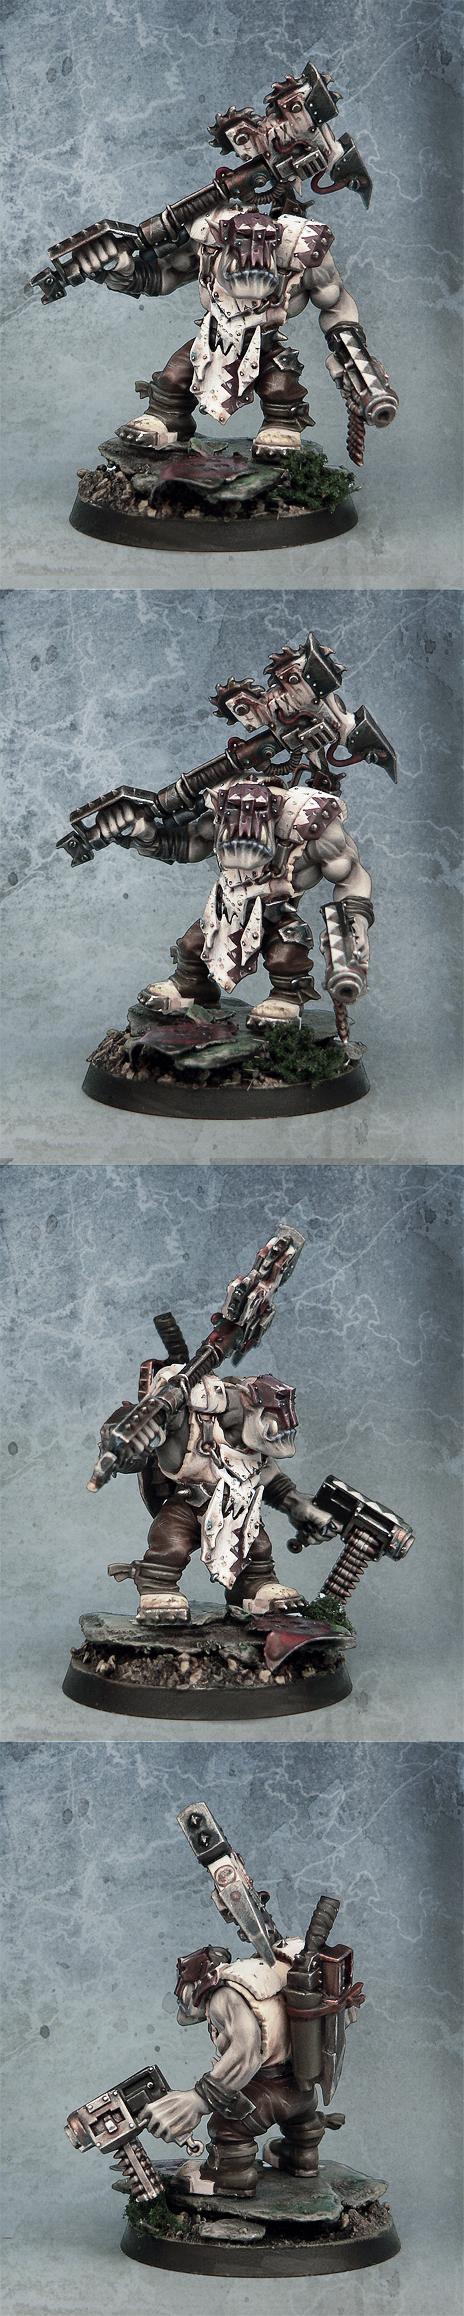 Albino, Axe, Nob, Orks, Warhammer 40,000